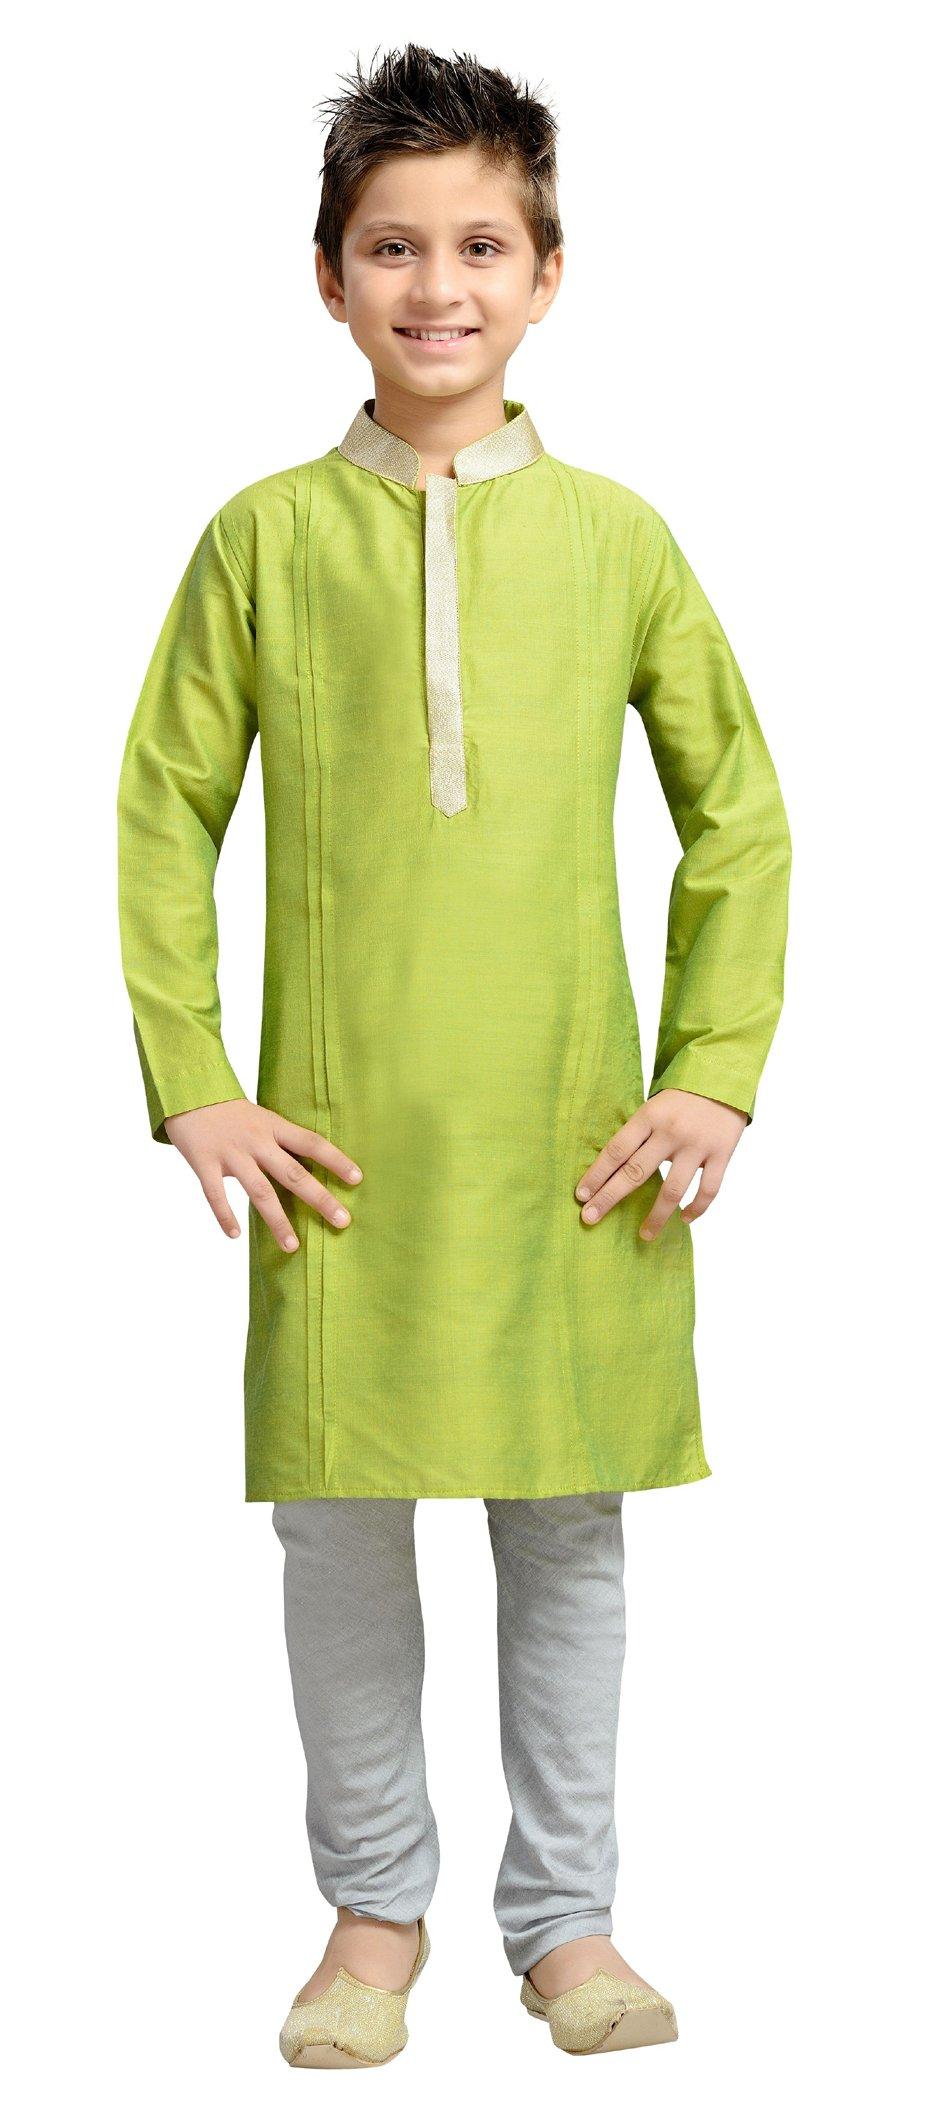 Cellora Churidar Kurta Pajama for 1-14 Years Kids Dupion Silk Party Wear Ethnic Dress